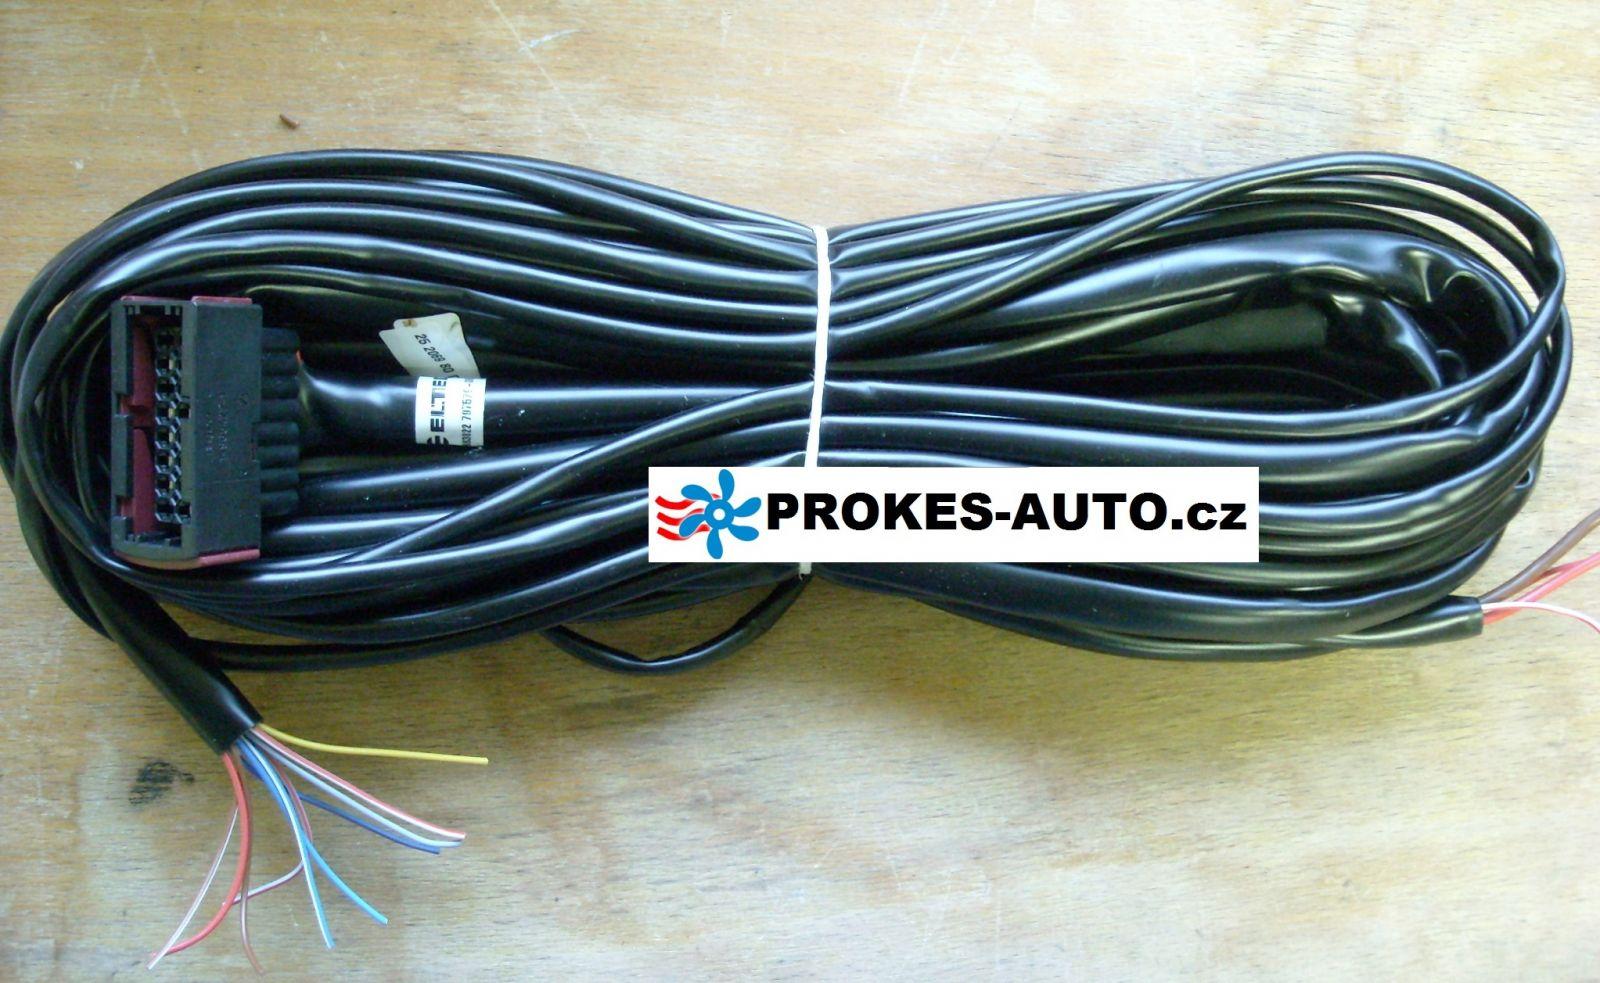 Kabelový svazek pro Airtronic D2 / D4 252069800200 Eberspächer